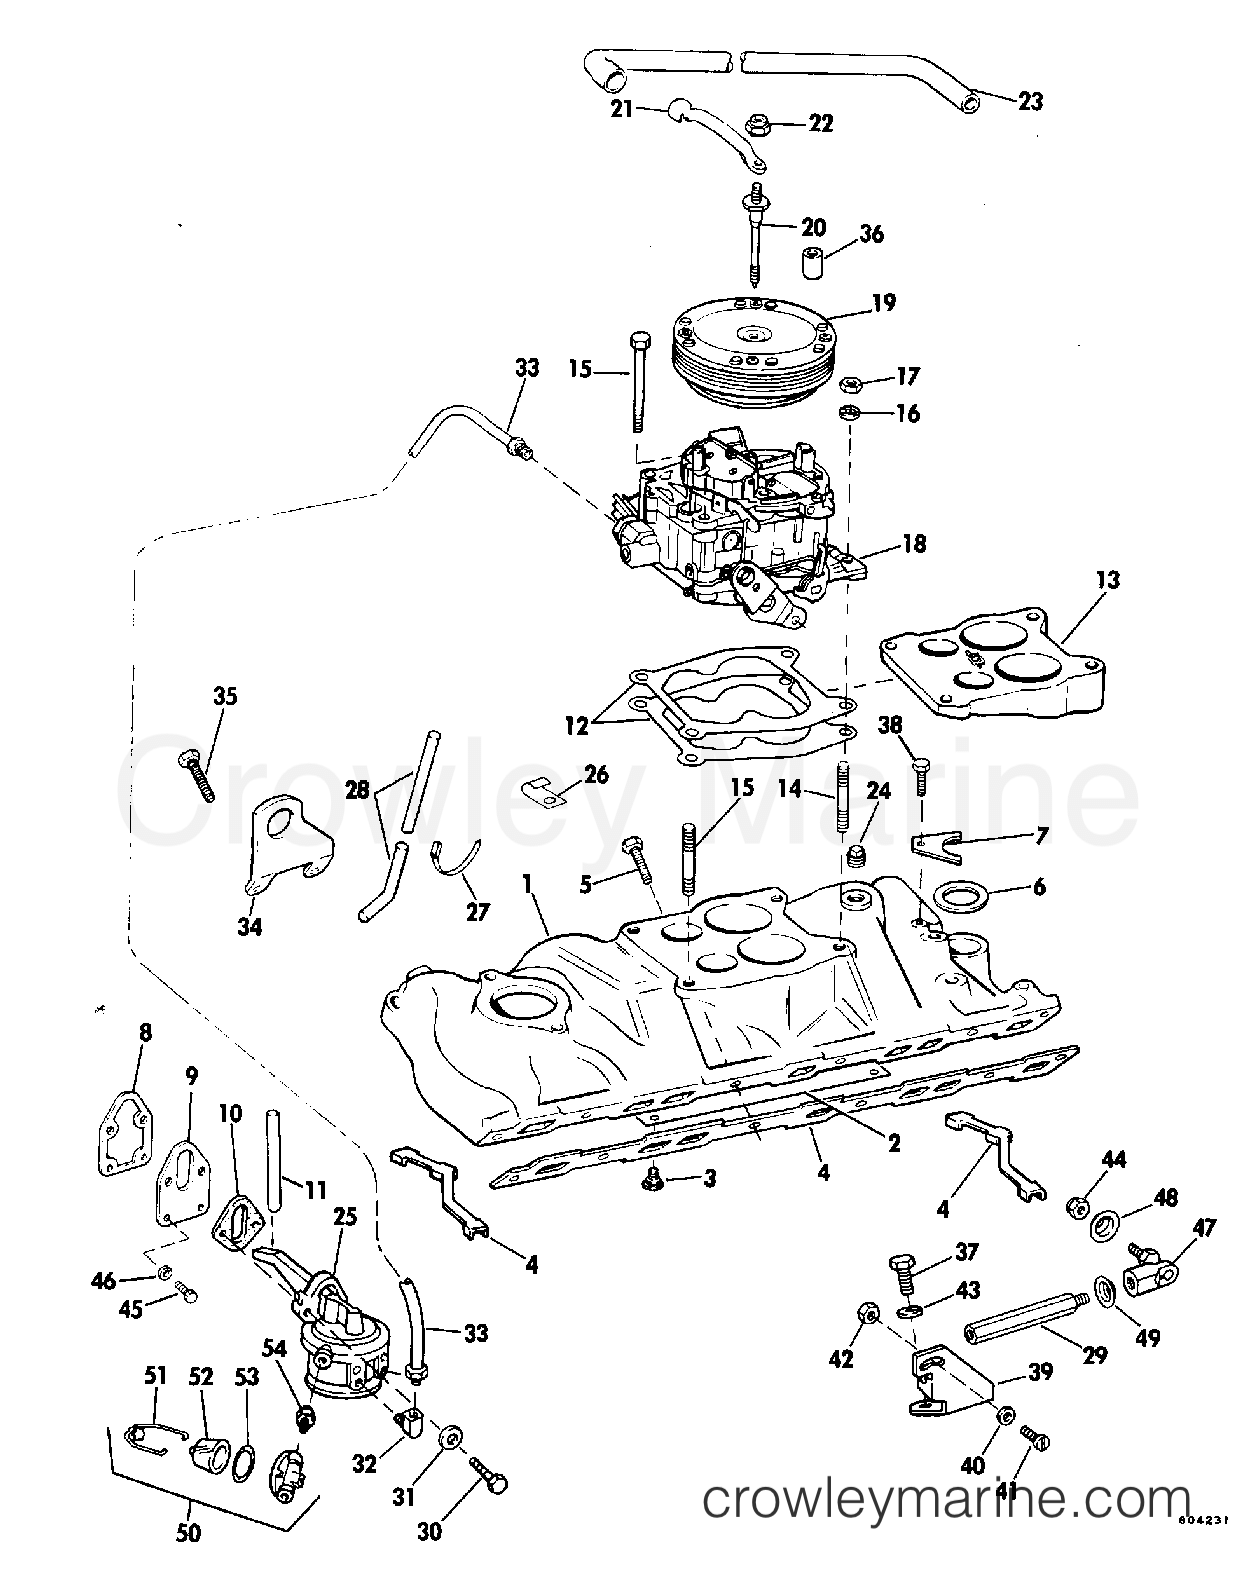 Intake Manifold Fuel Pump And Carburetor Lines